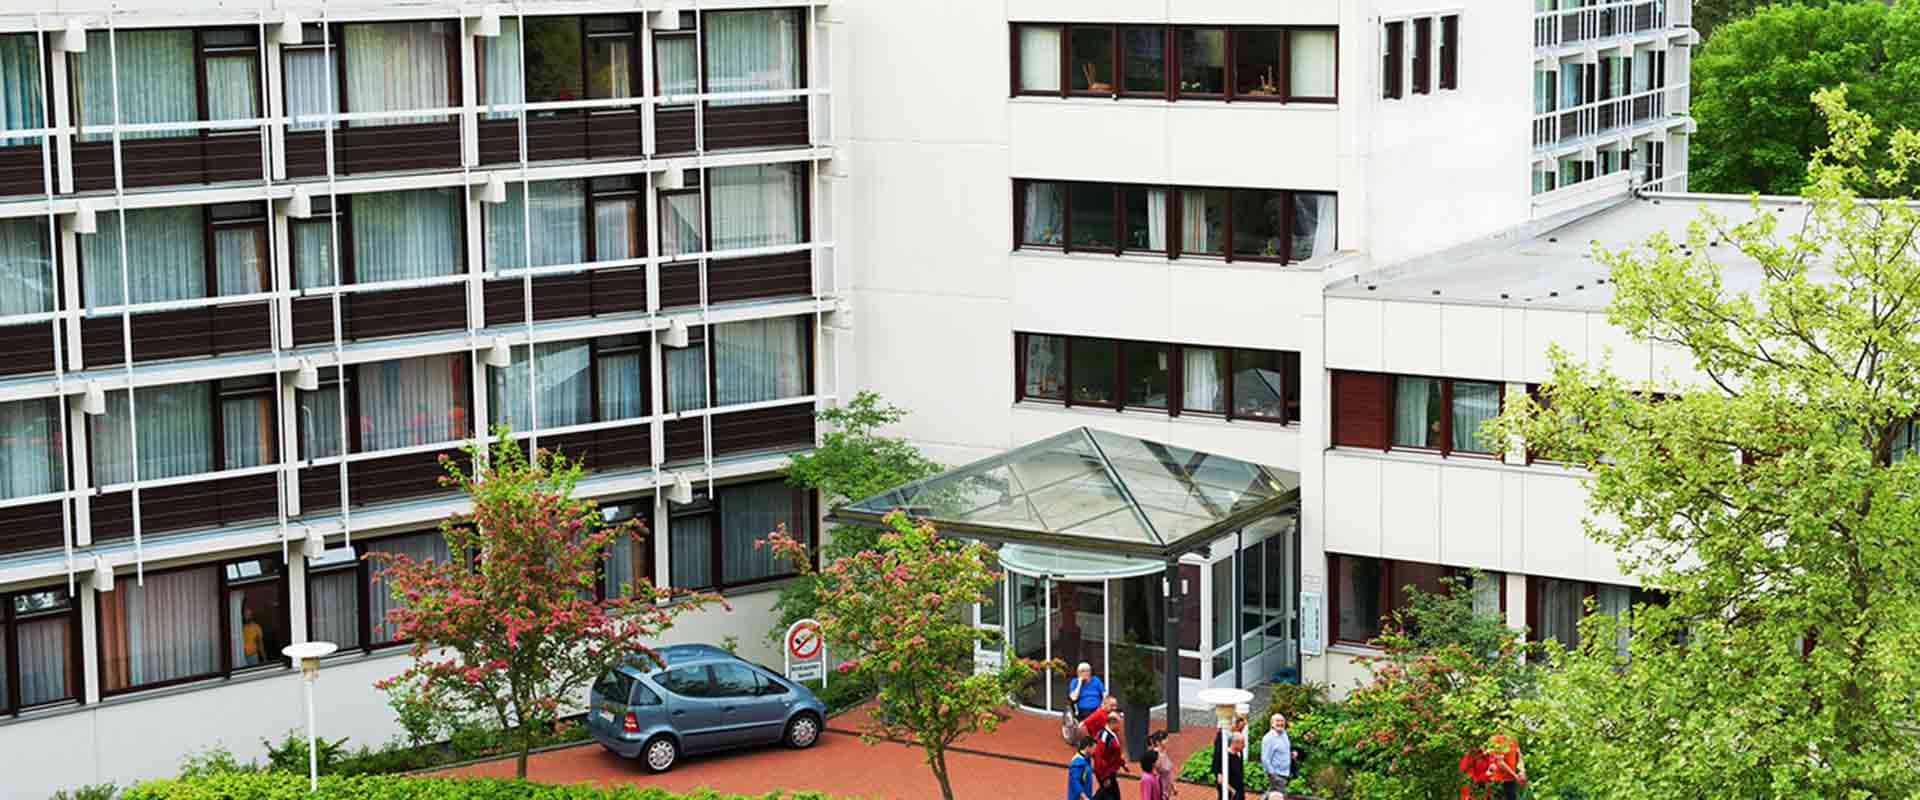 Gebäude MEDIAN Klaus-Miehlke-Klinik Wiesbaden